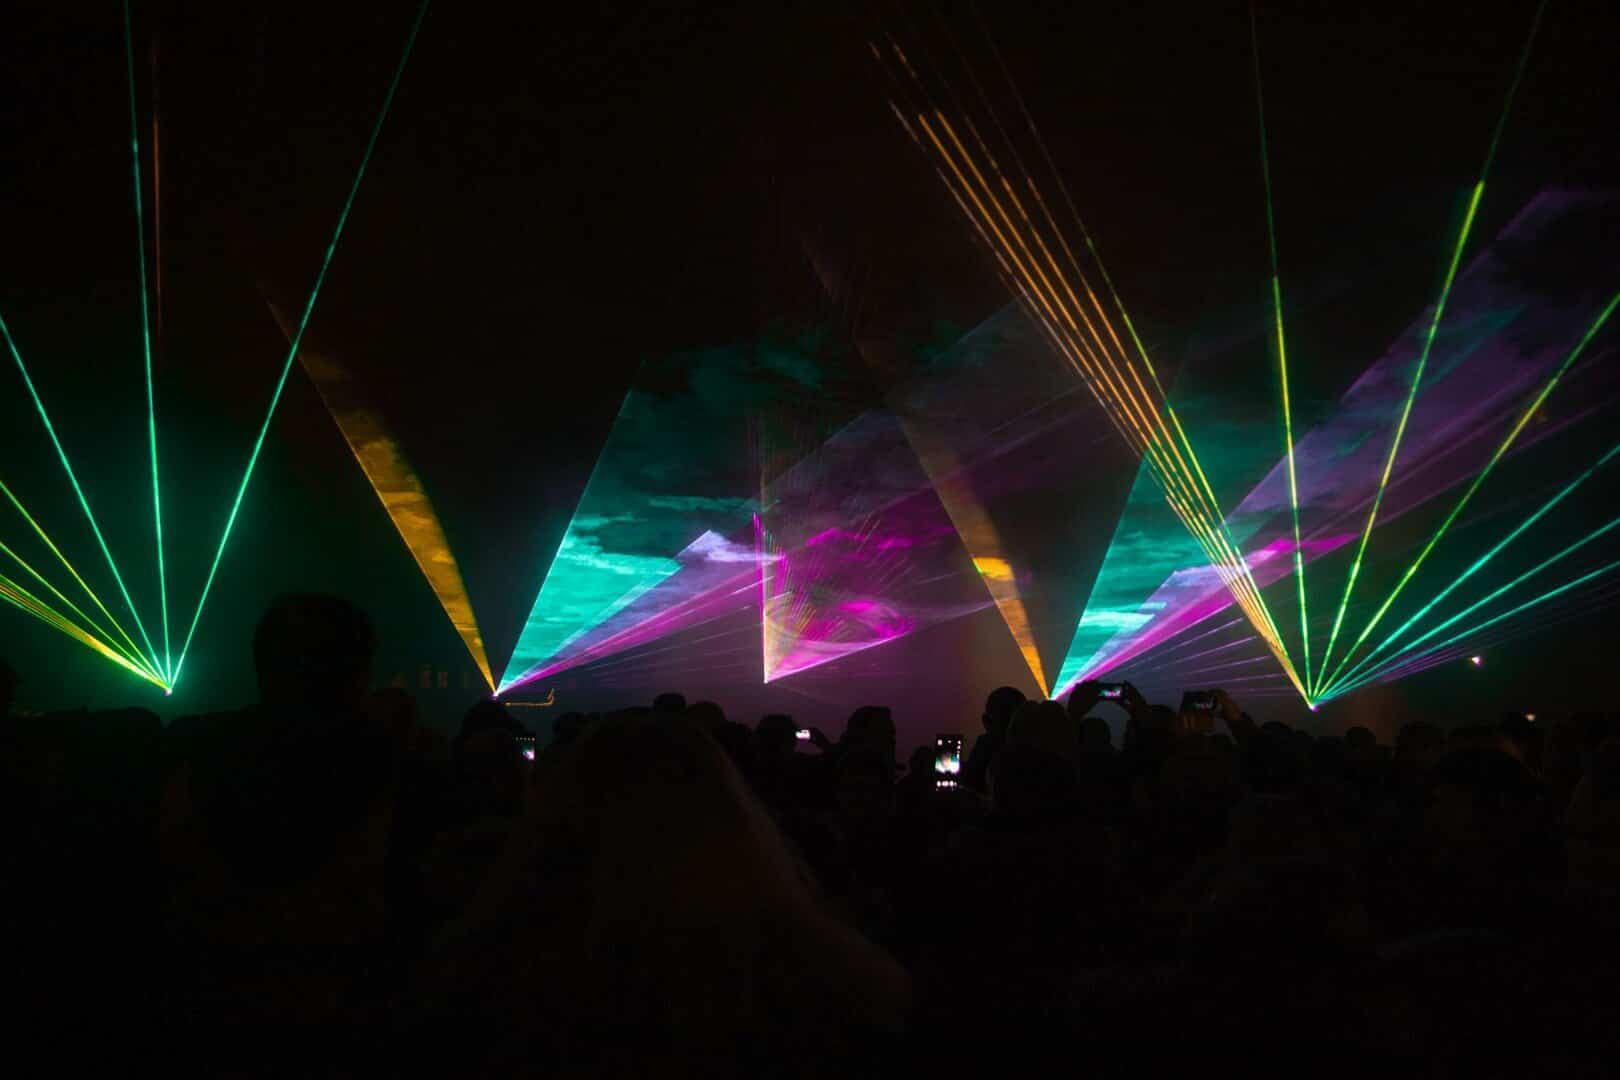 Lasershow zu Silvester in Verl